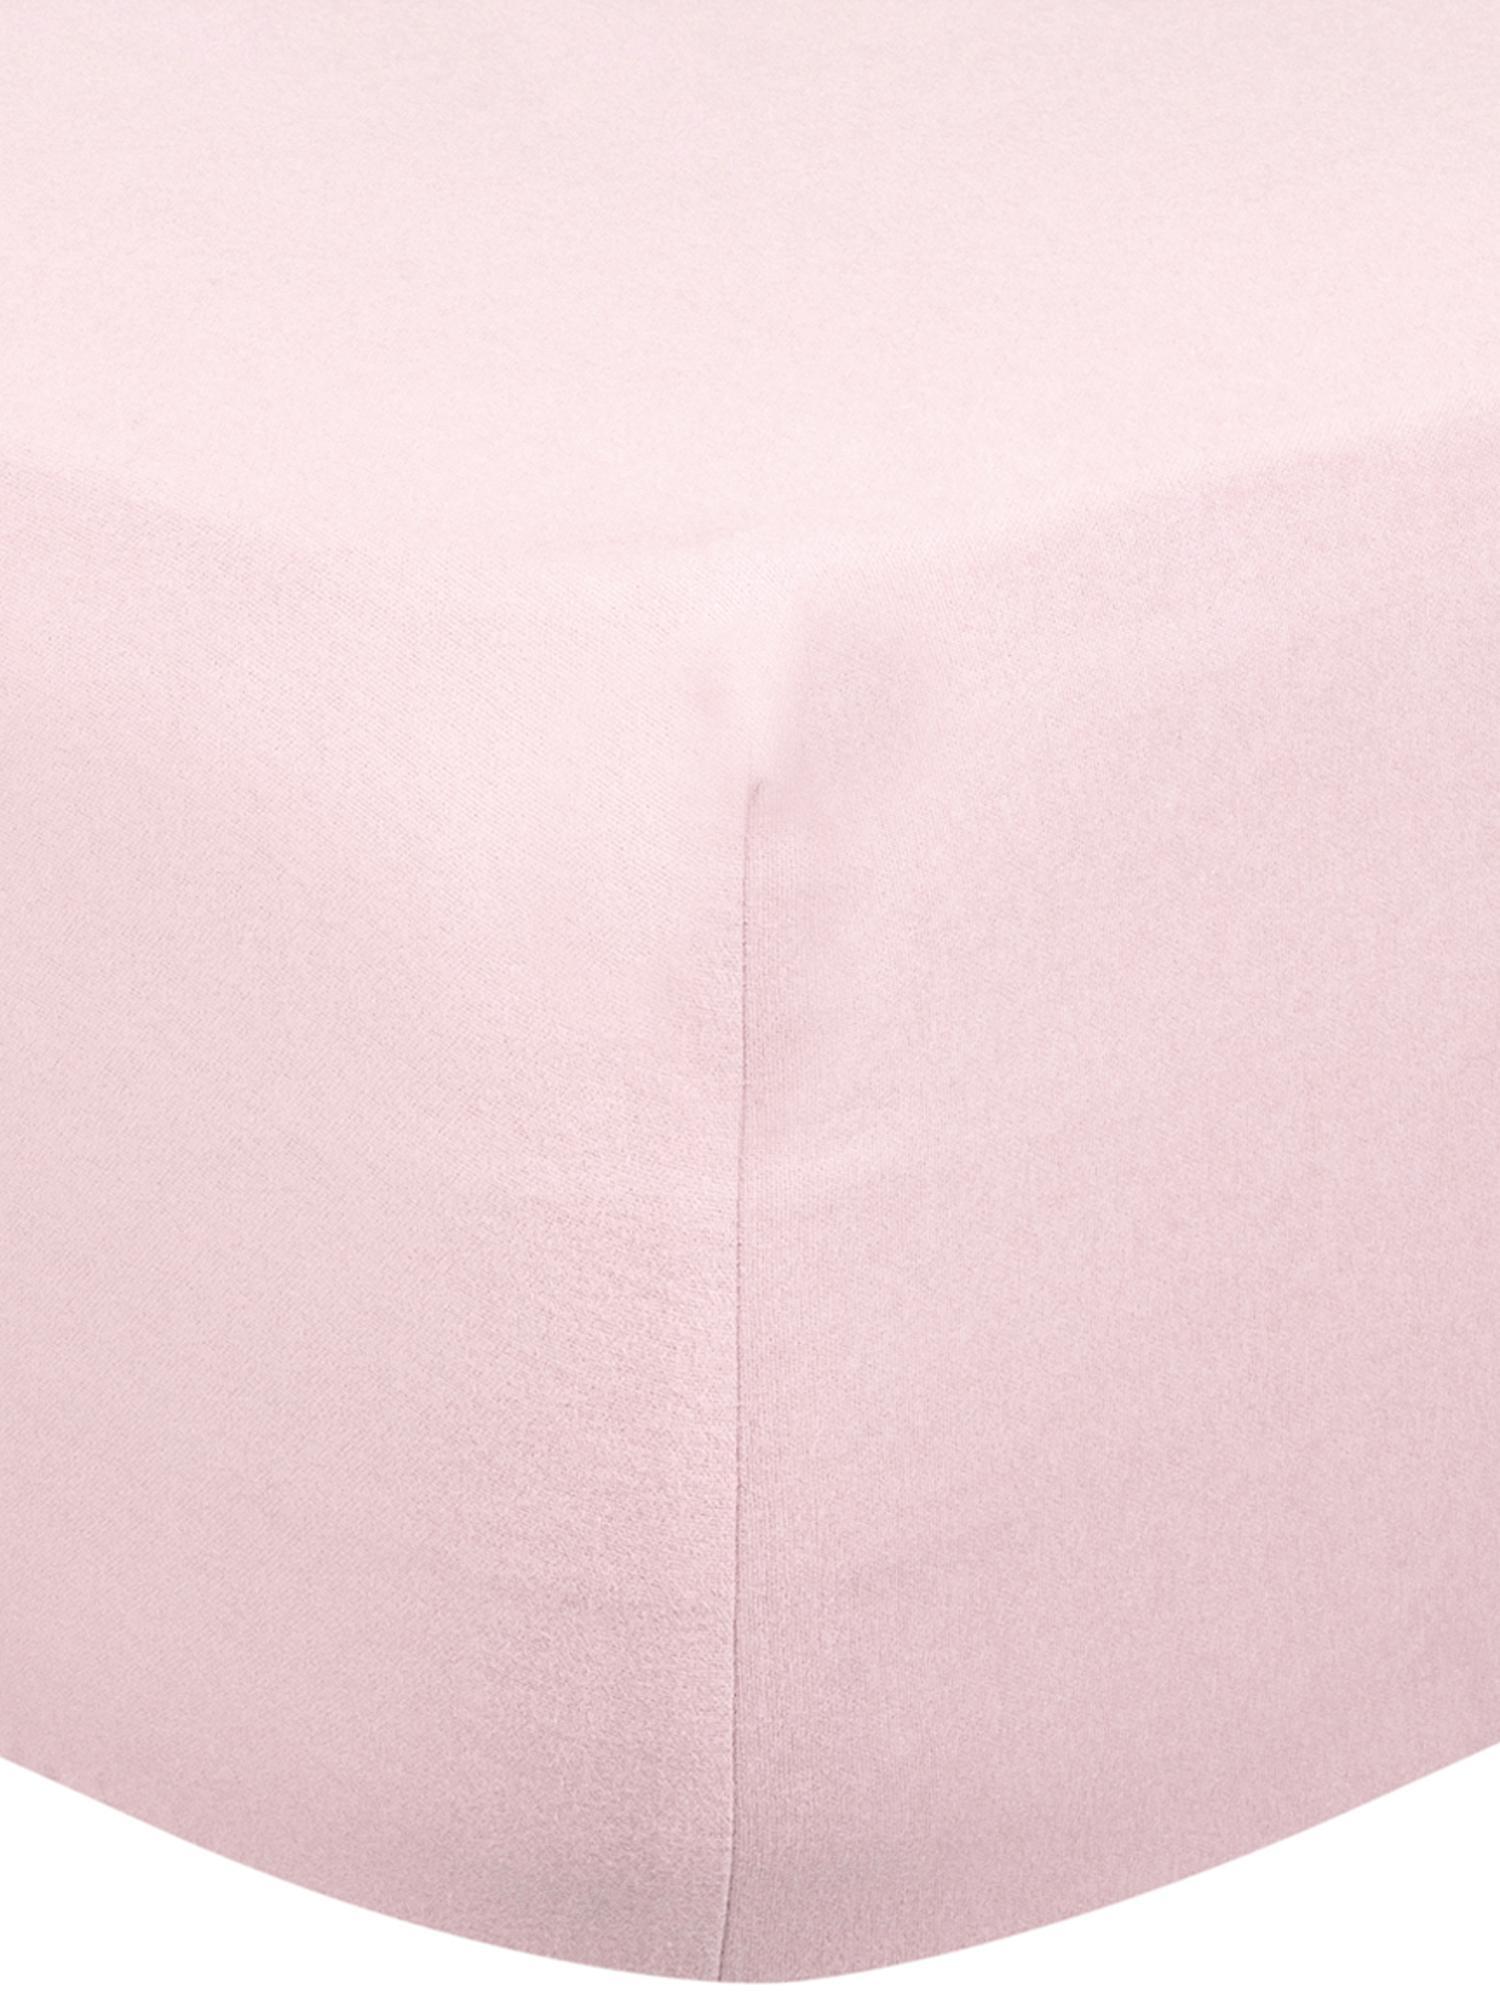 Spannbettlaken Biba in Rosa, Flanell, Webart: Flanell Flanell ist ein s, Rosa, 140 x 200 cm